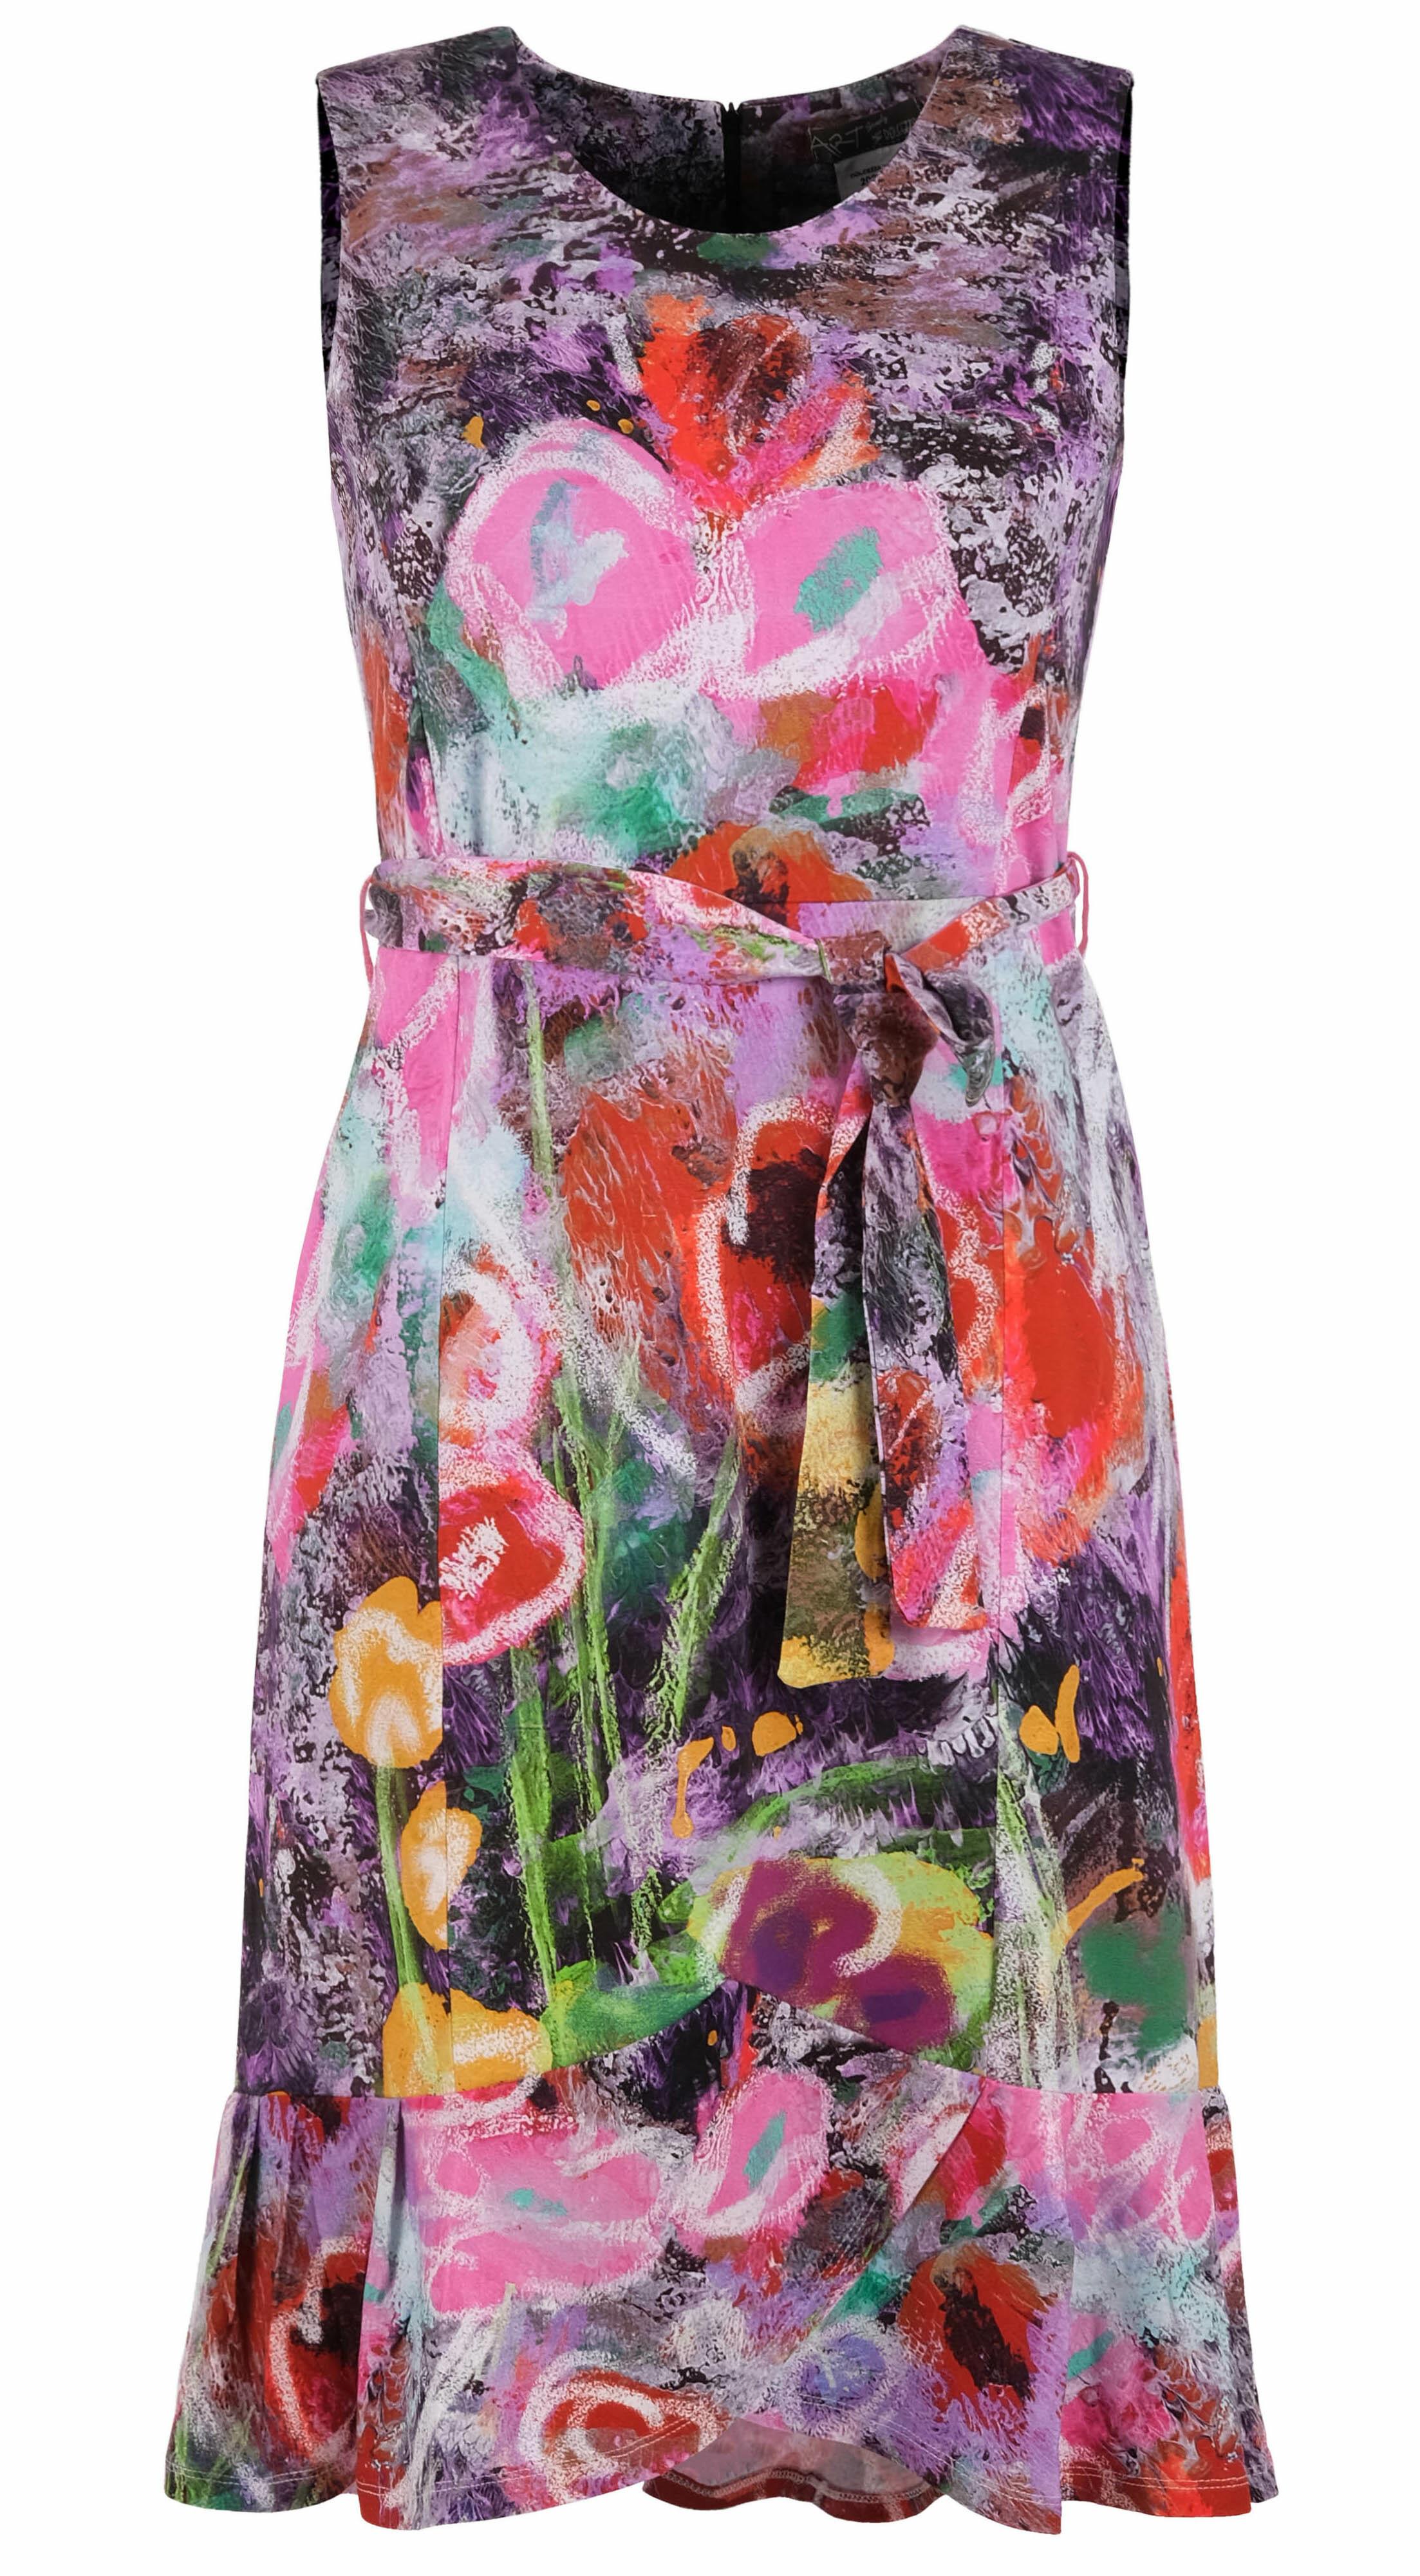 Simply Art Dolcezza: Wildest Flowers Tulip Hem Abstract Art Dress DOLCEZZA_SIMPLYART_20607_N